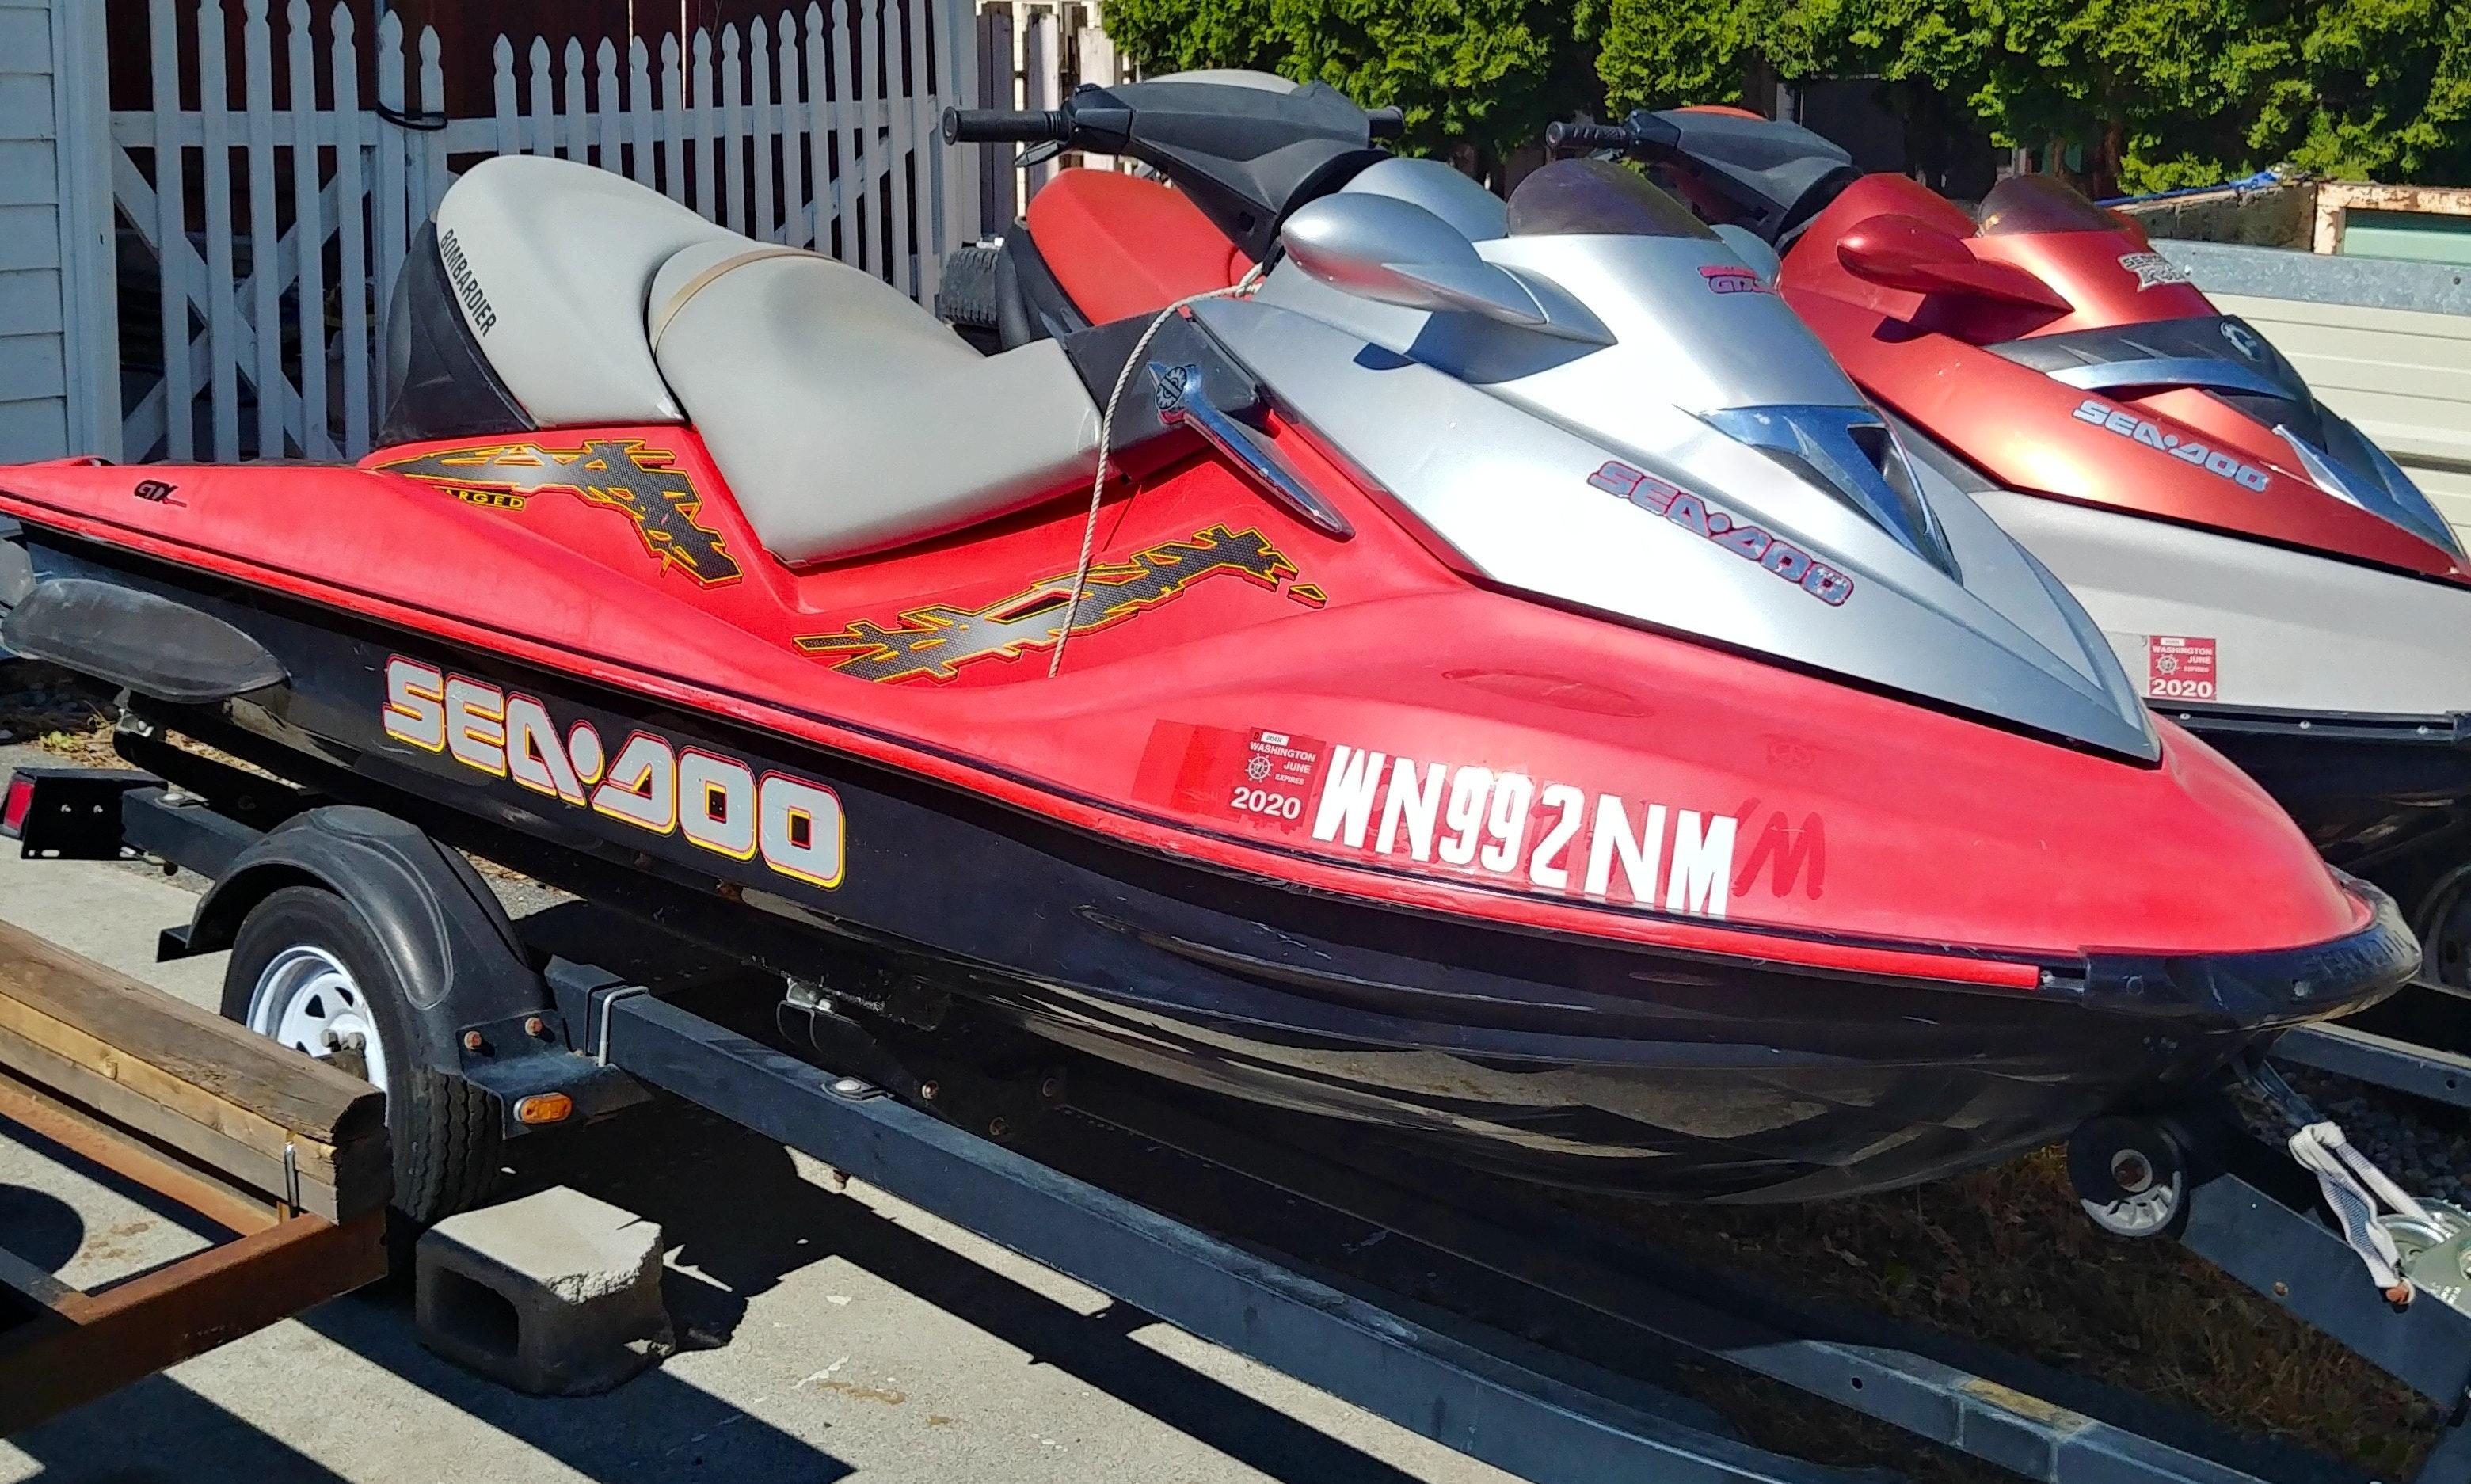 Affordable Jet Ski Rental Free Delivery In Moses Lake Banks Lake Lake Roosevelt Getmyboat